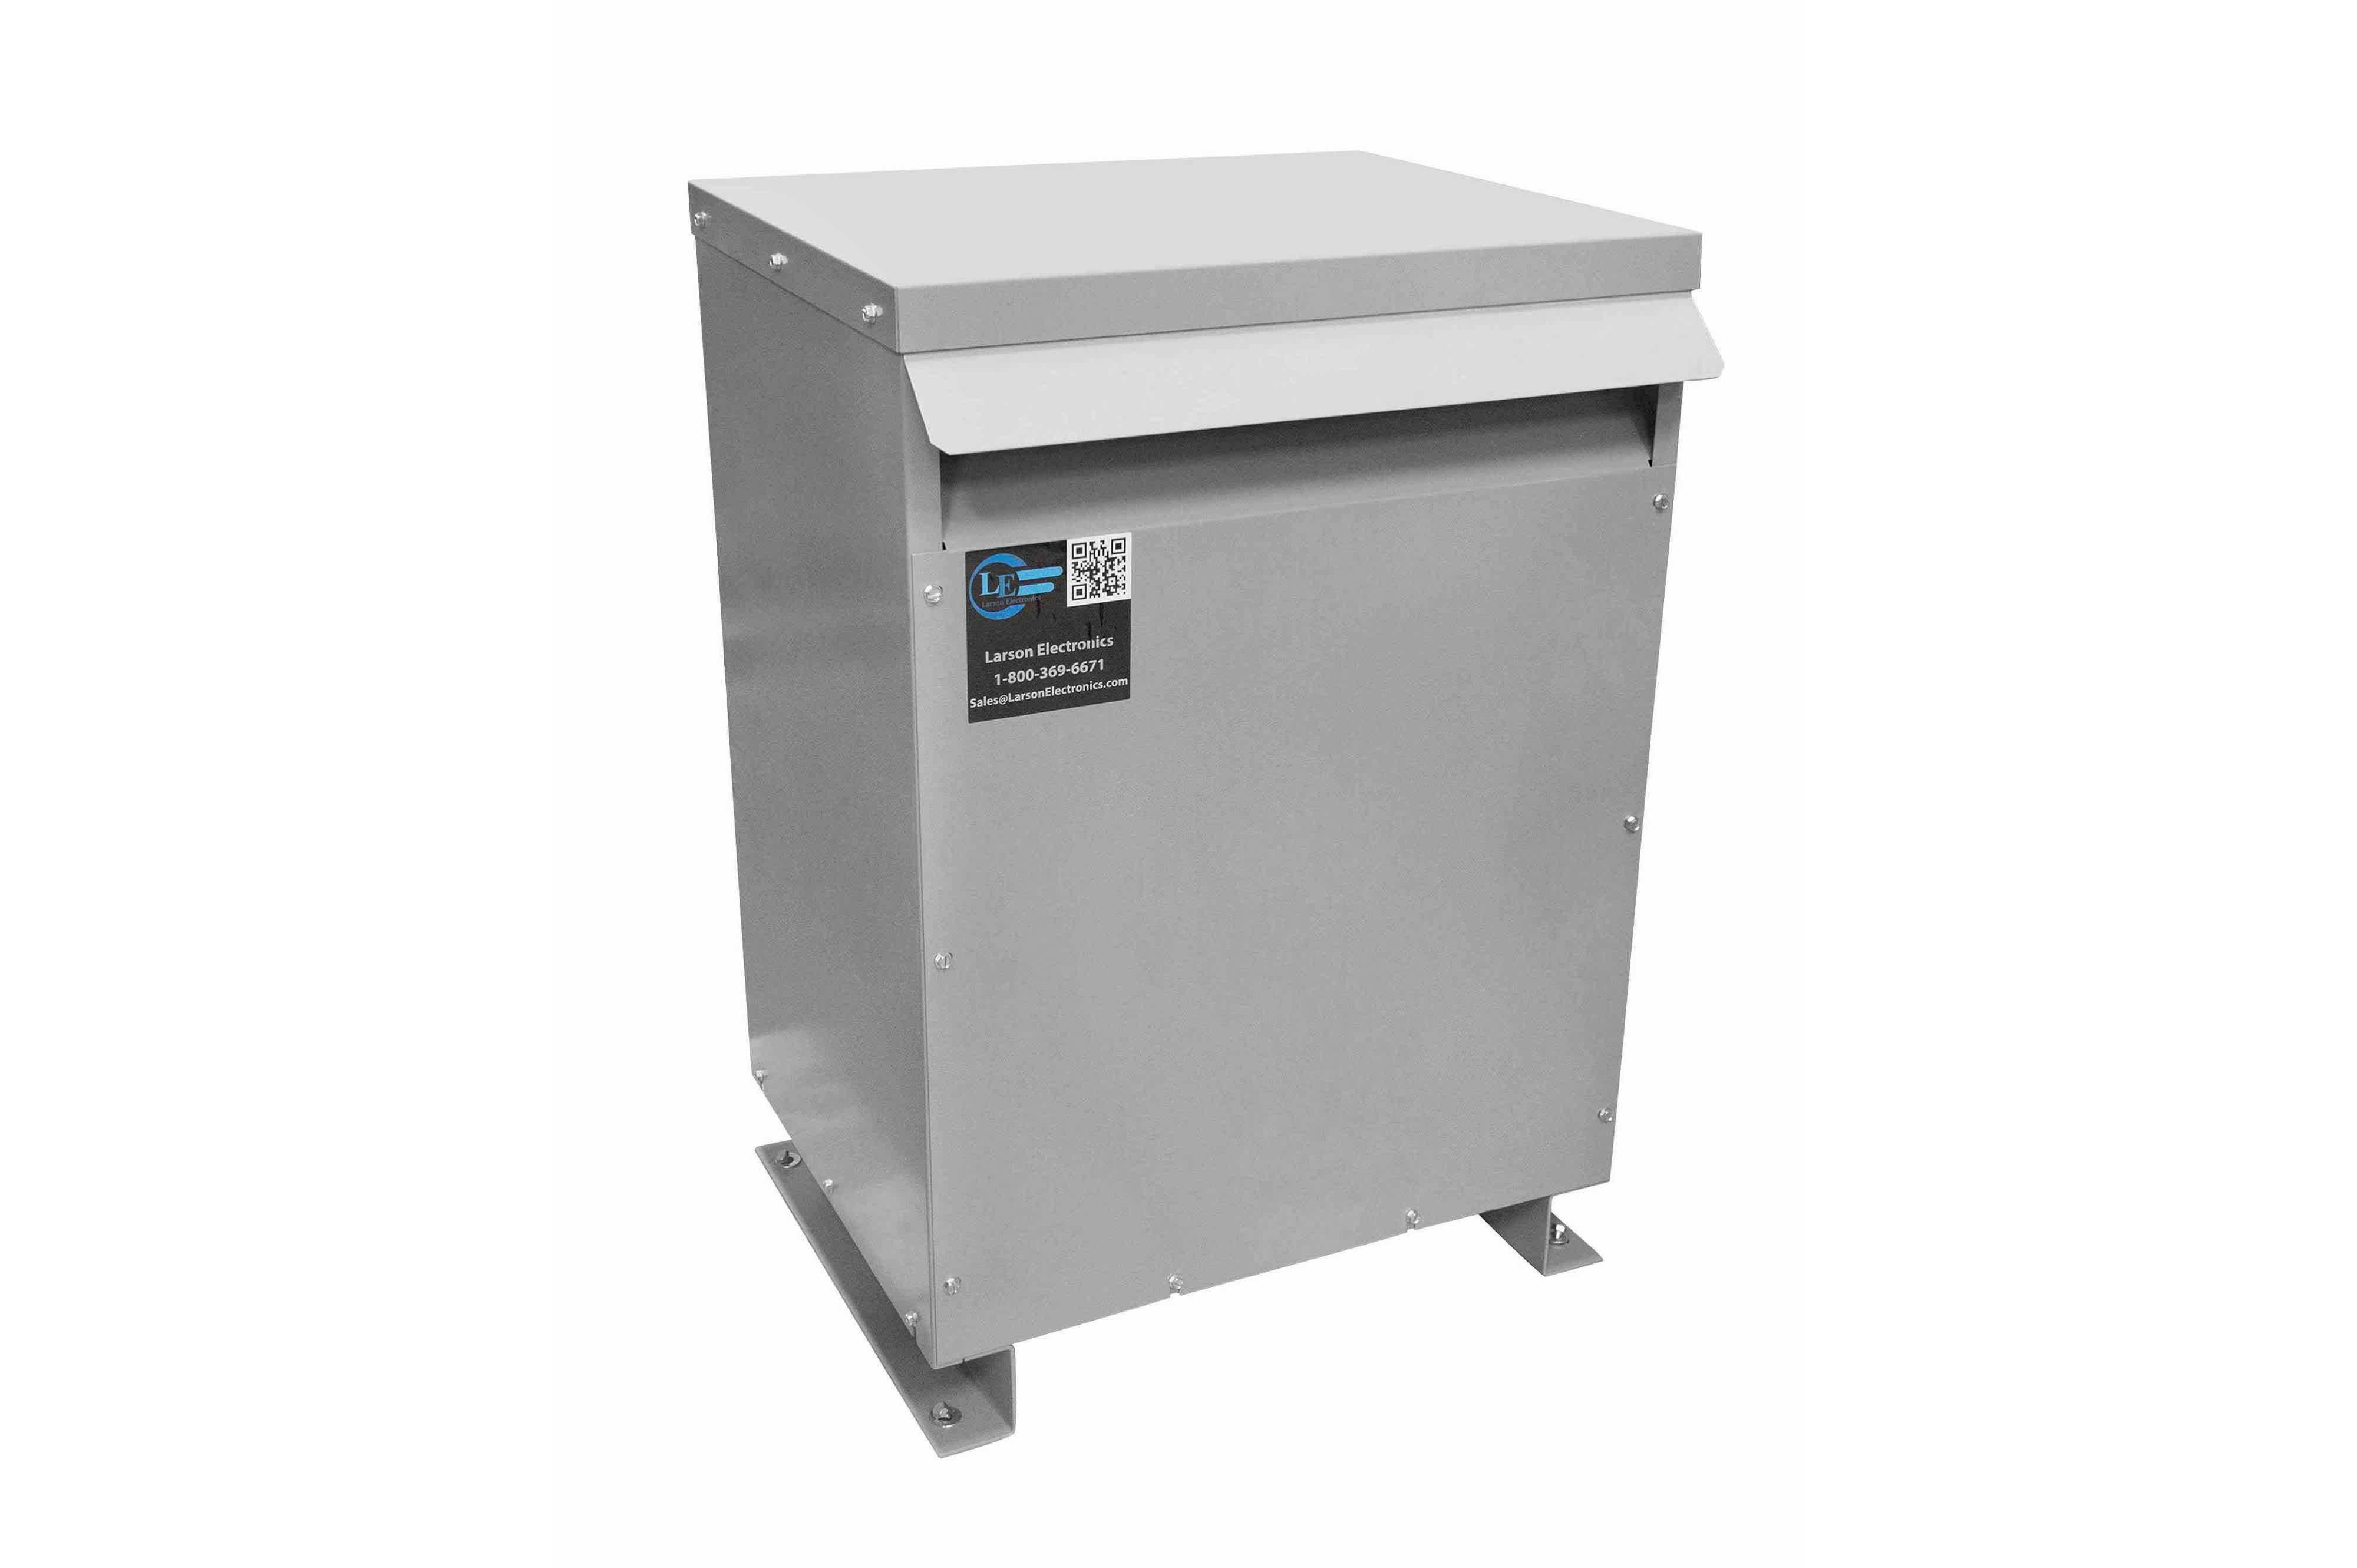 750 kVA 3PH Isolation Transformer, 415V Wye Primary, 480Y/277 Wye-N Secondary, N3R, Ventilated, 60 Hz